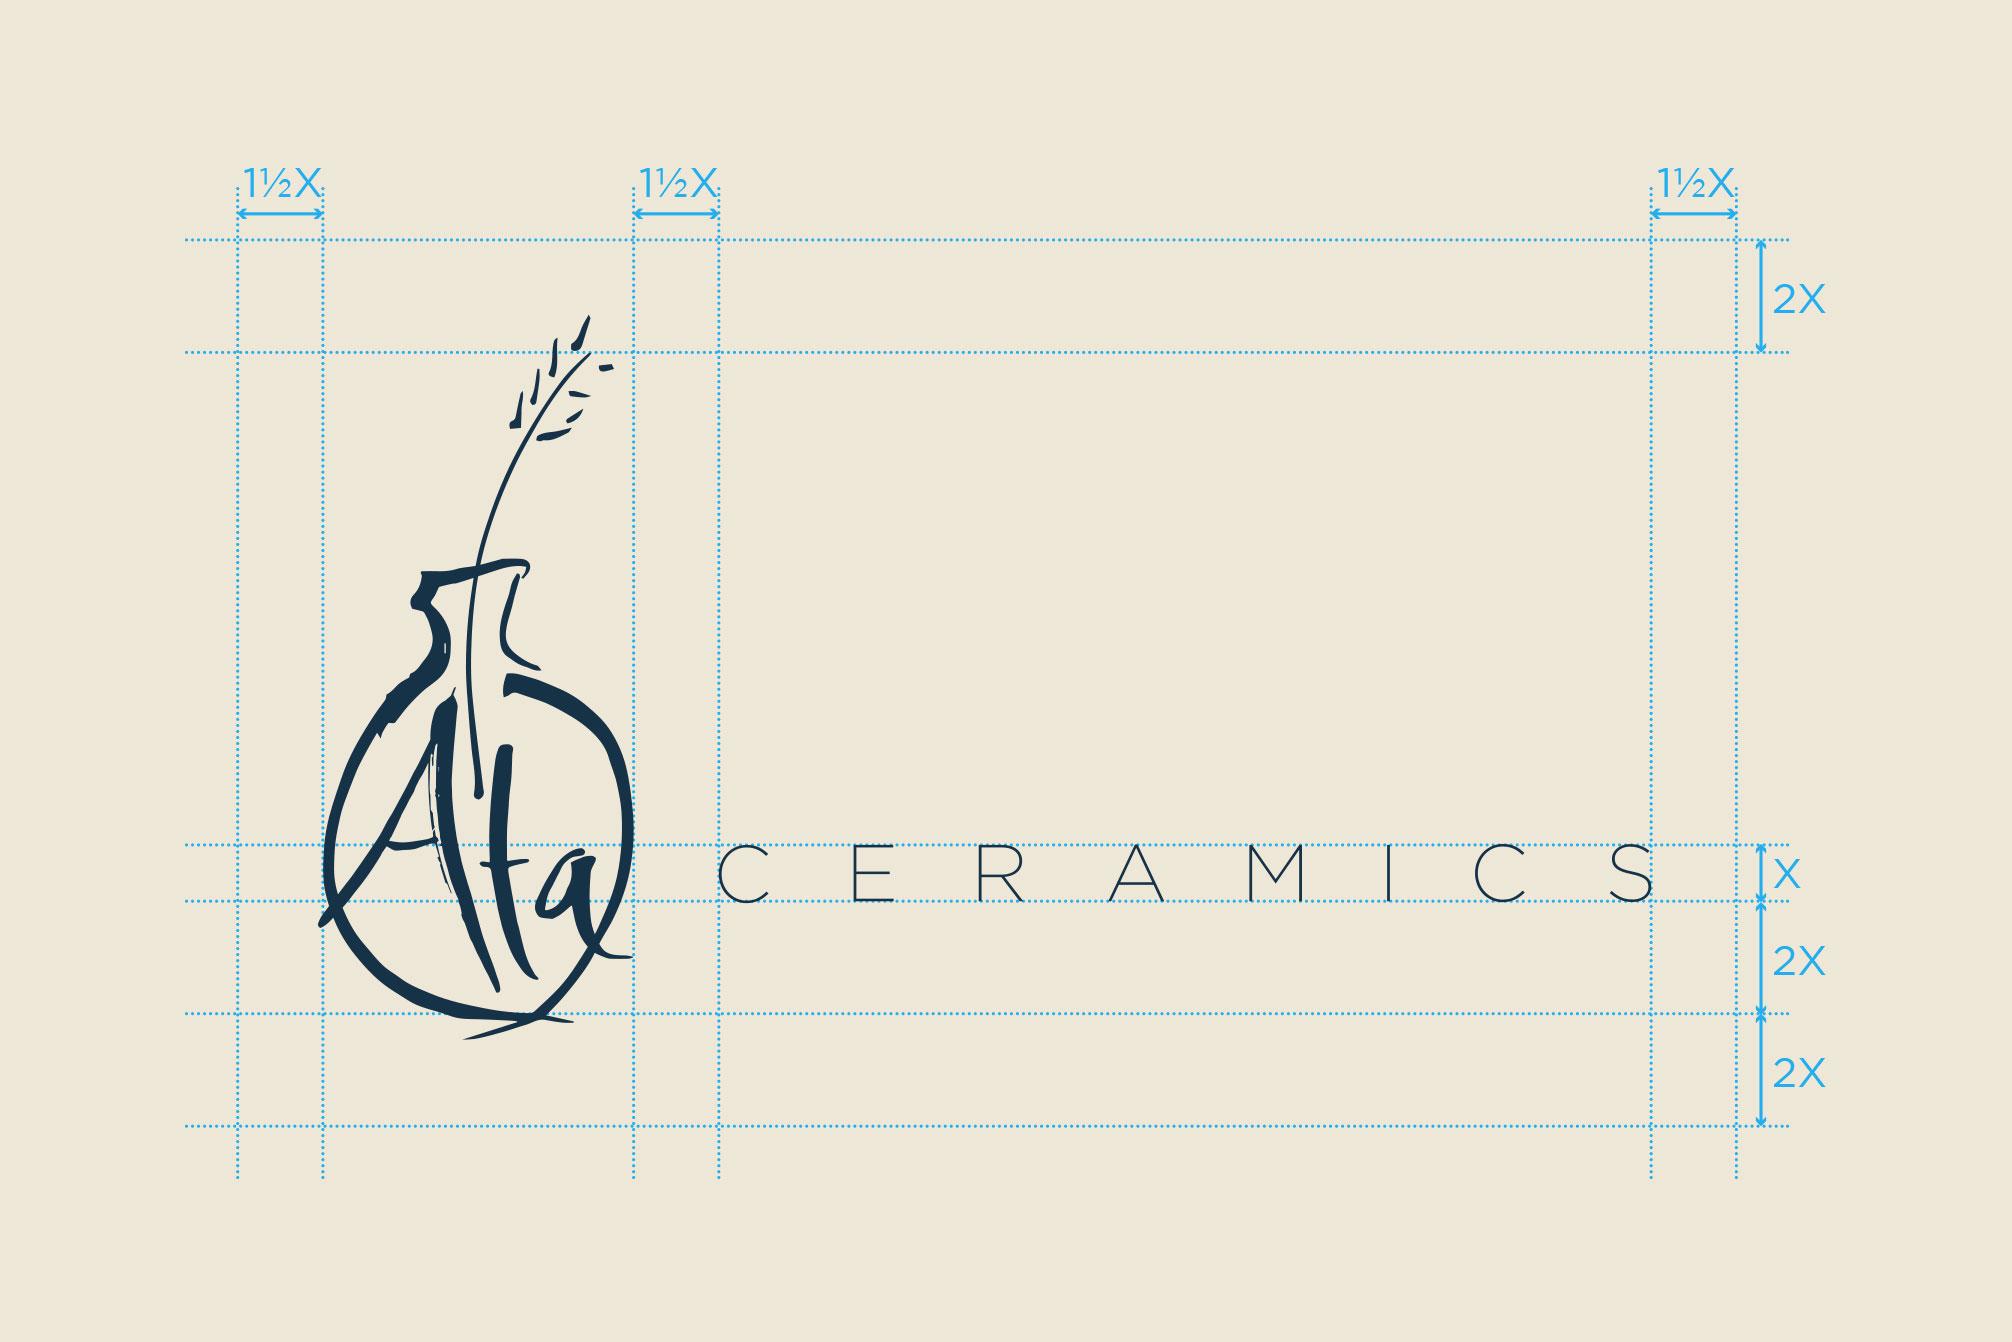 Ata Ceramics - Jn Creative